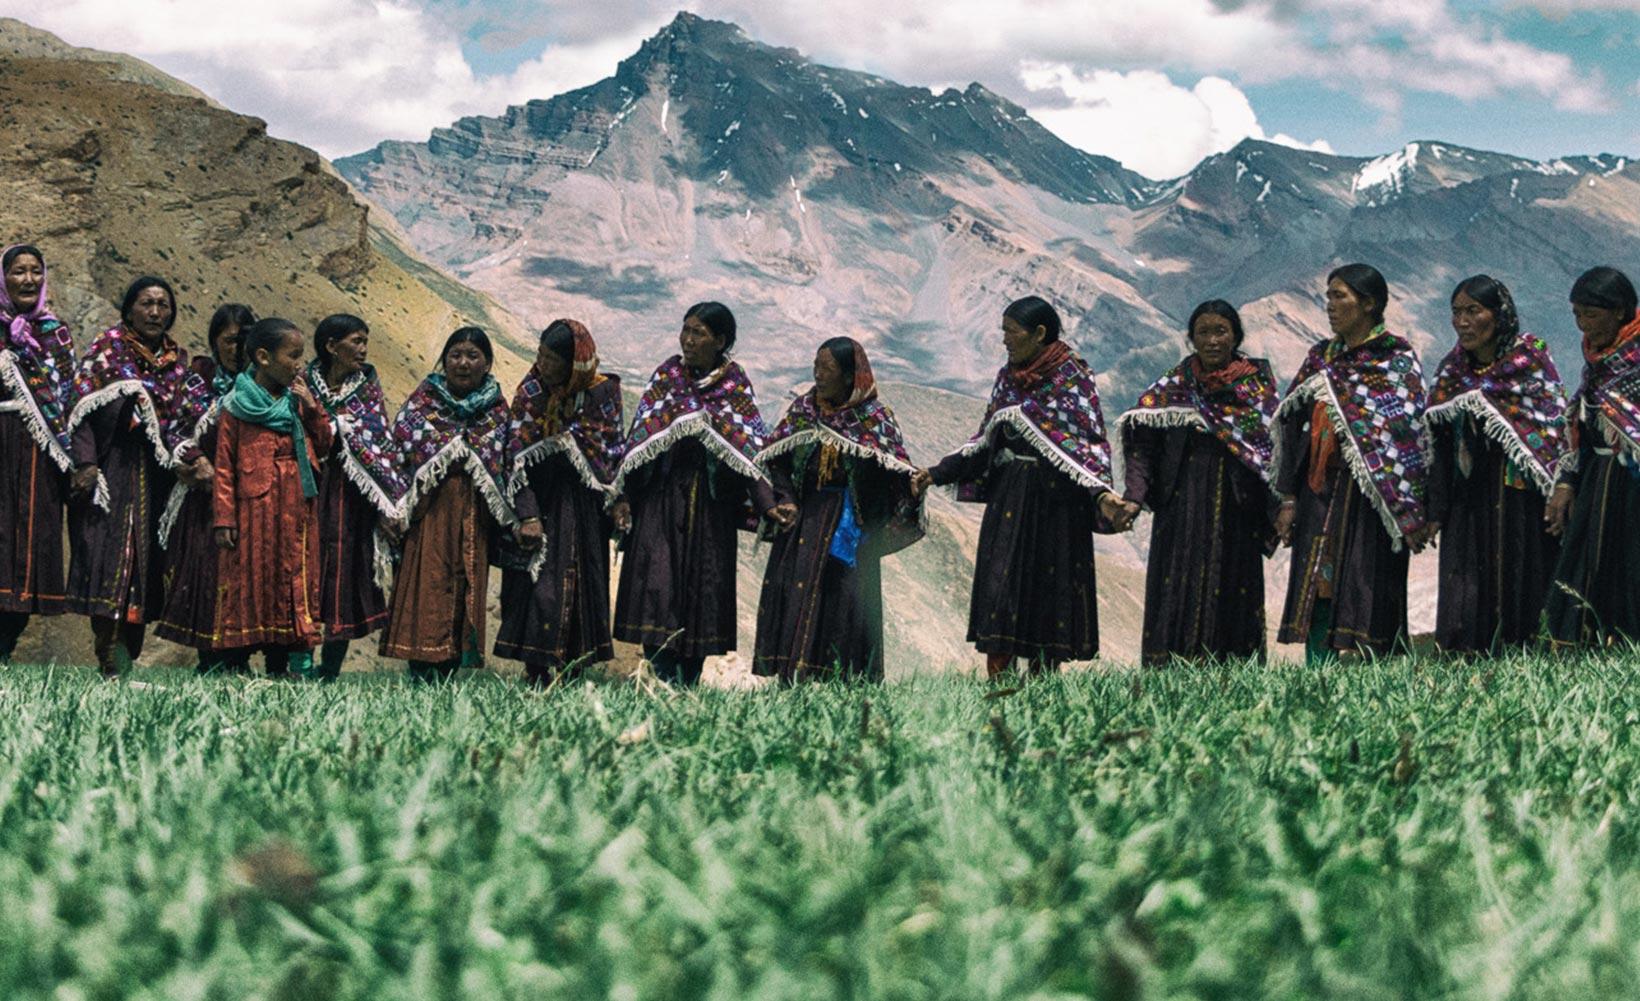 Namkhan Festival In The Spiritual Spiti Valley